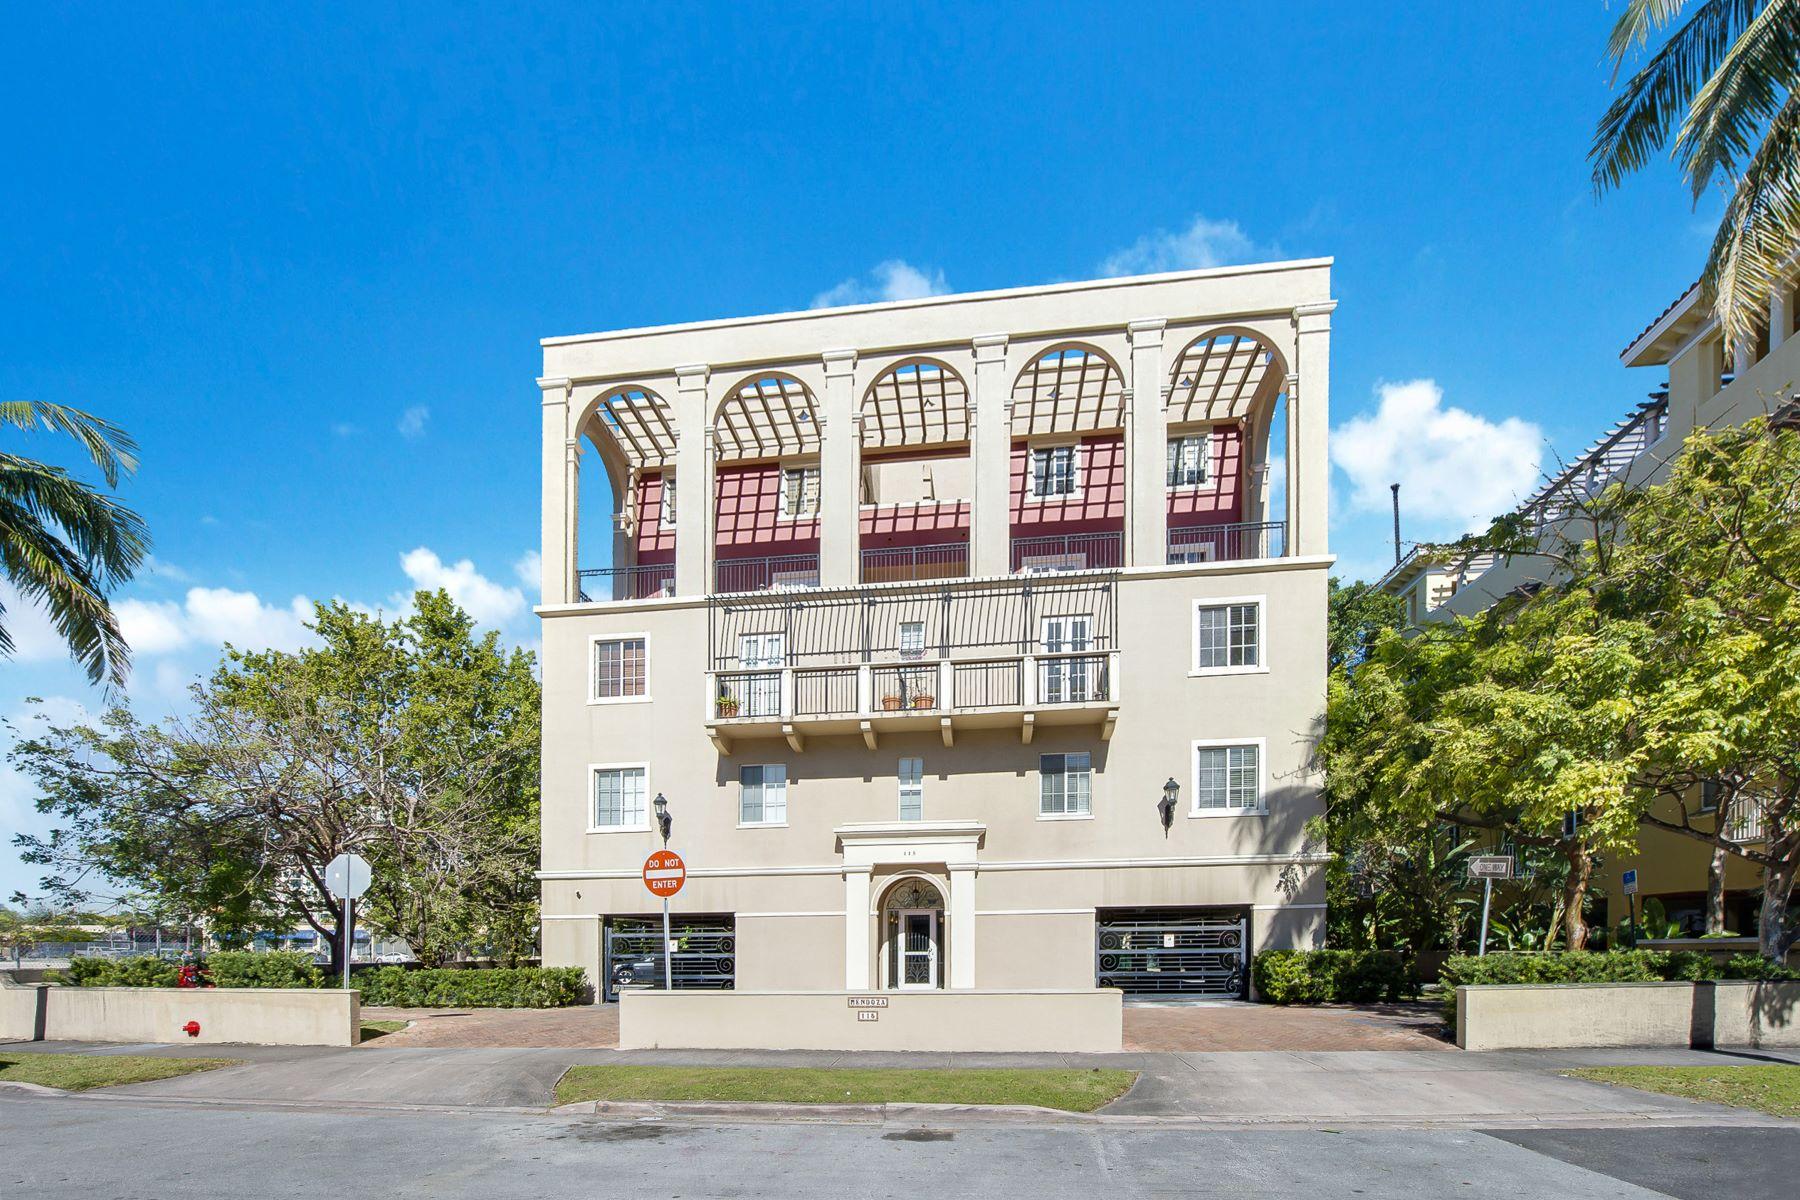 Condominium for Rent at 115 Mendoza Ave 115 Mendoza Ave 302 Coral Gables, Florida 33134 United States